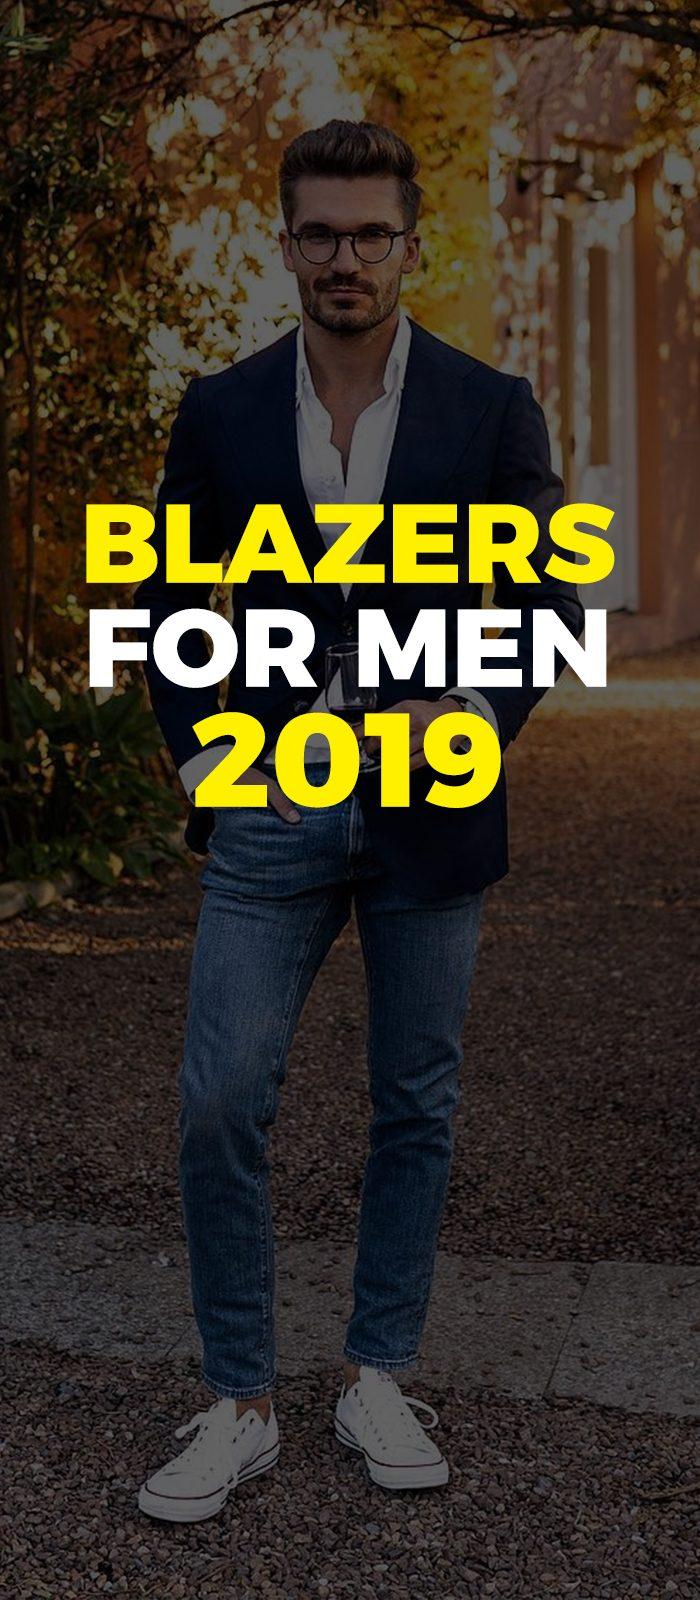 Top 5 Blazer looks for Men